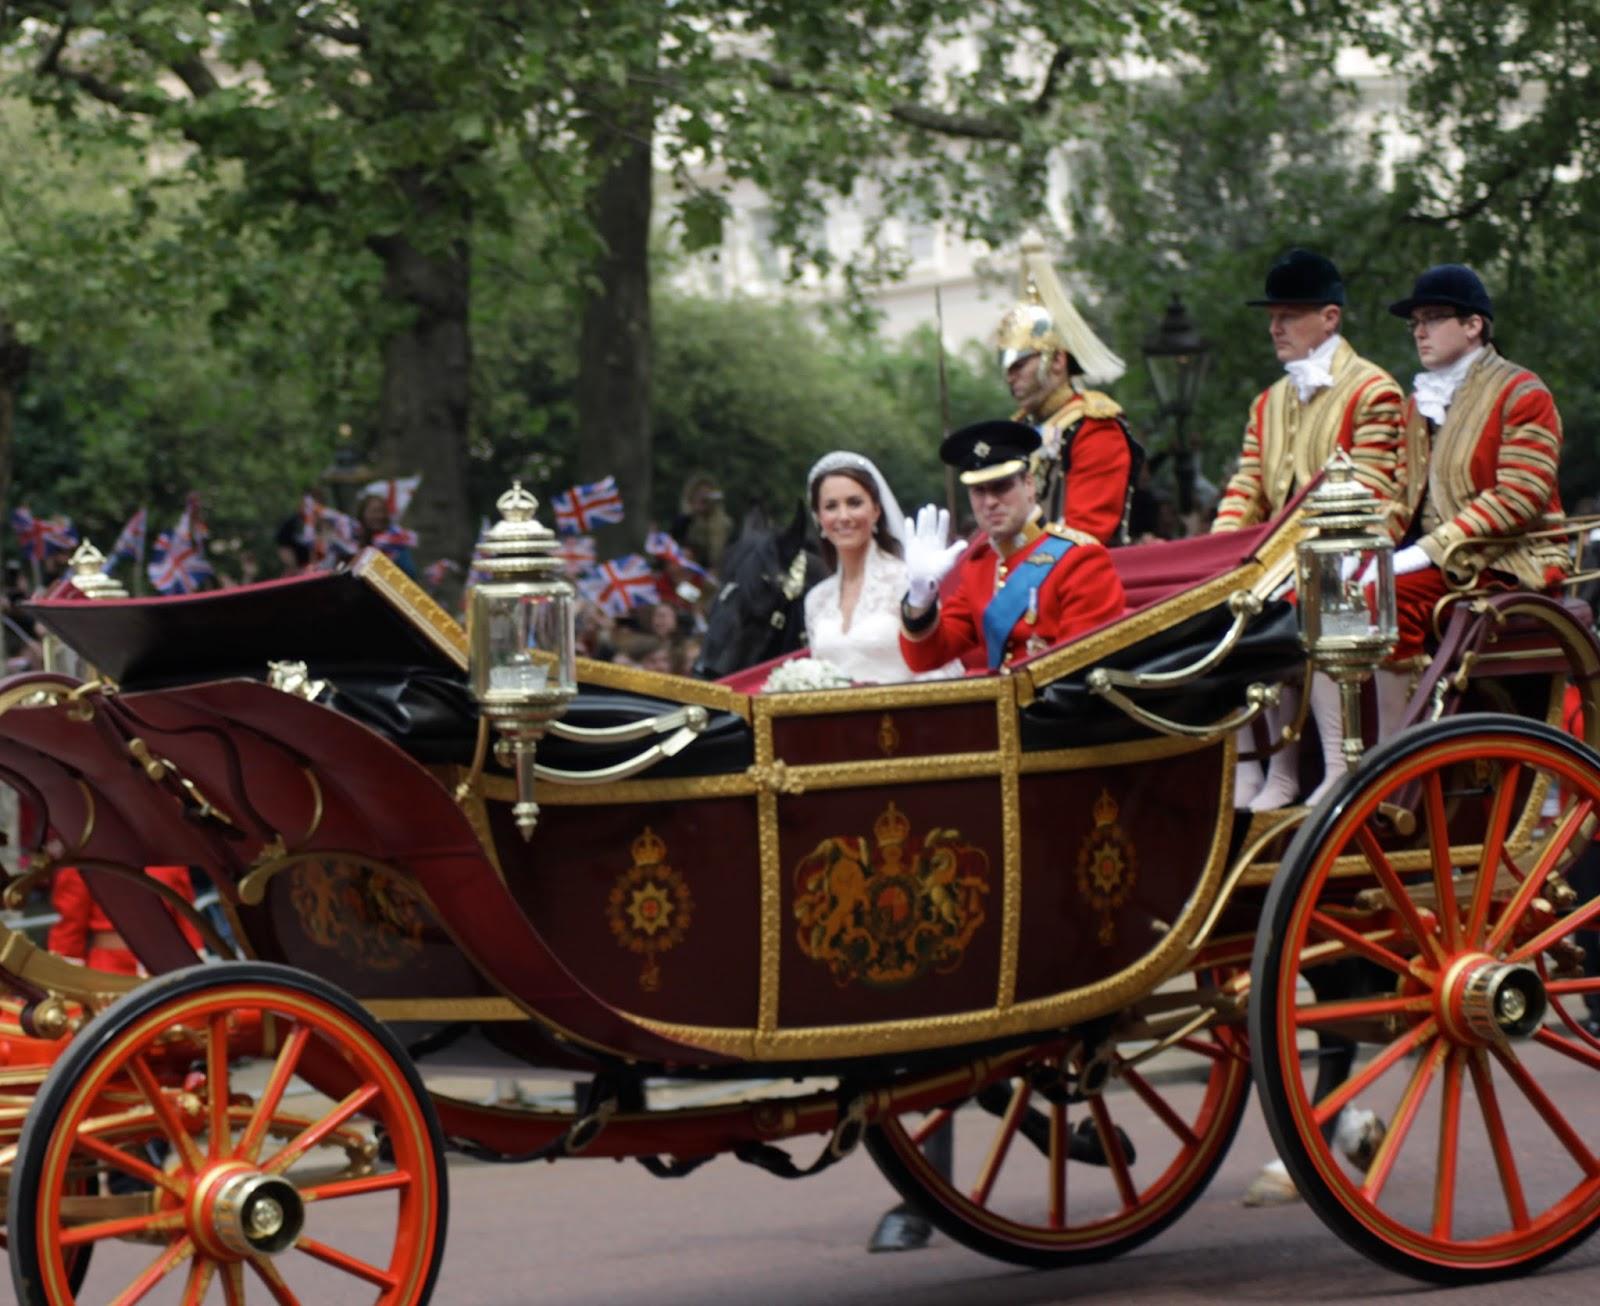 unusual historicals weddings in history royal weddings in  the most recent english royal wedding